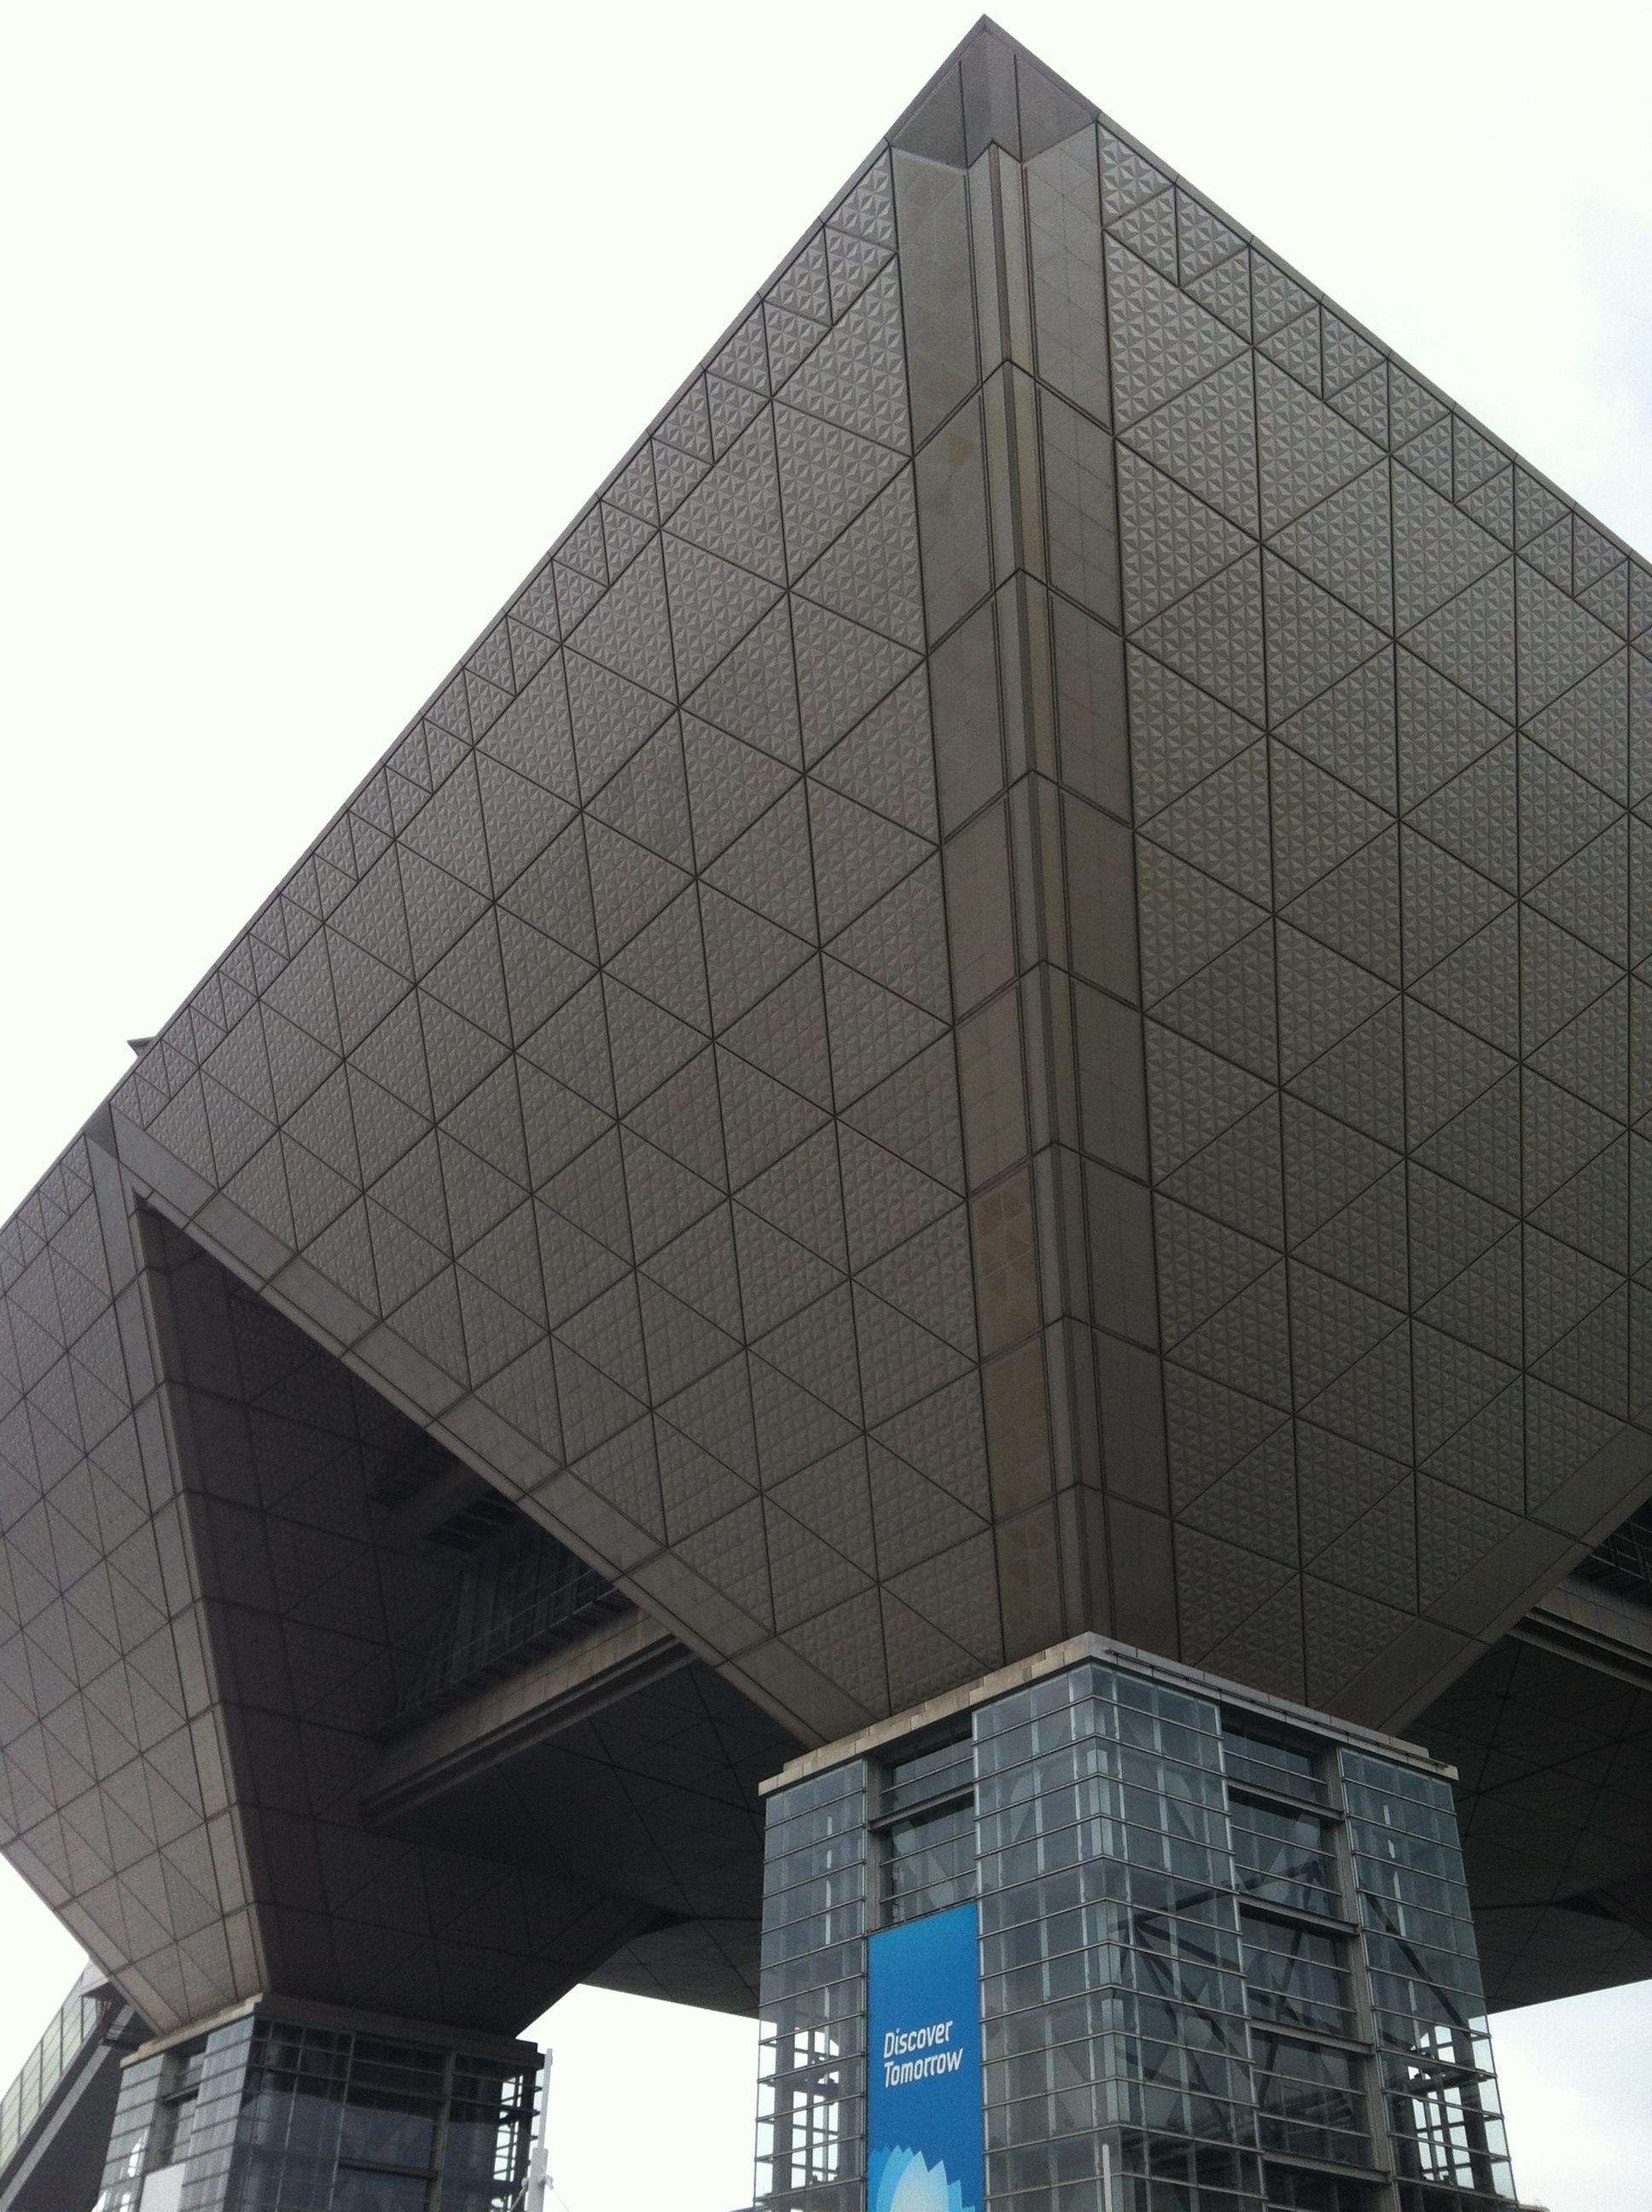 Tokyo Big Sight (Tokyo International Exhibition Center) image6